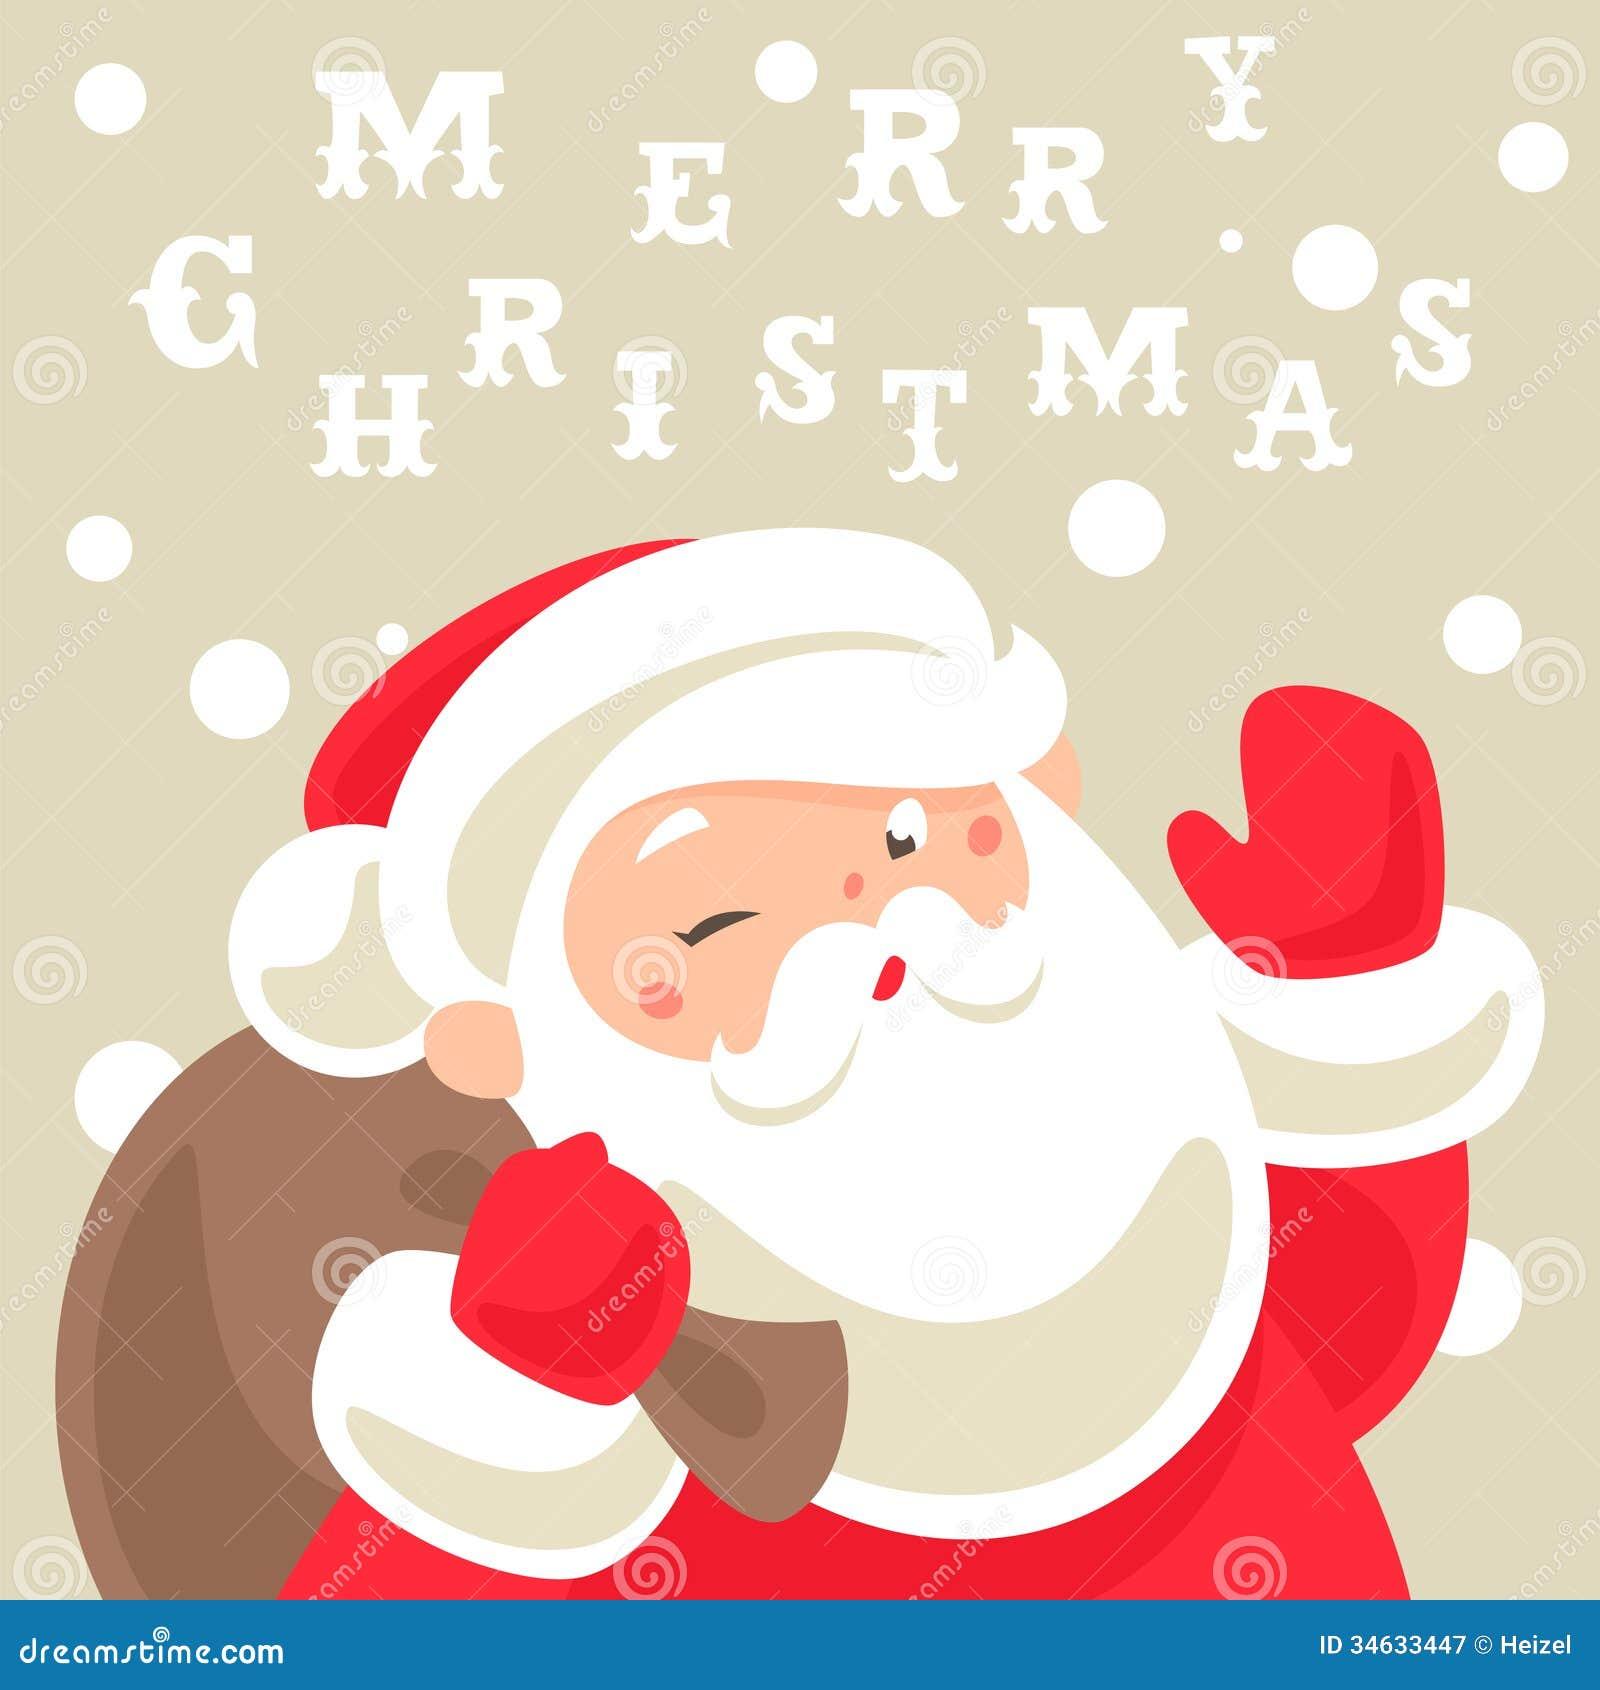 santa claus christmas card - Santa Claus Christmas Cards